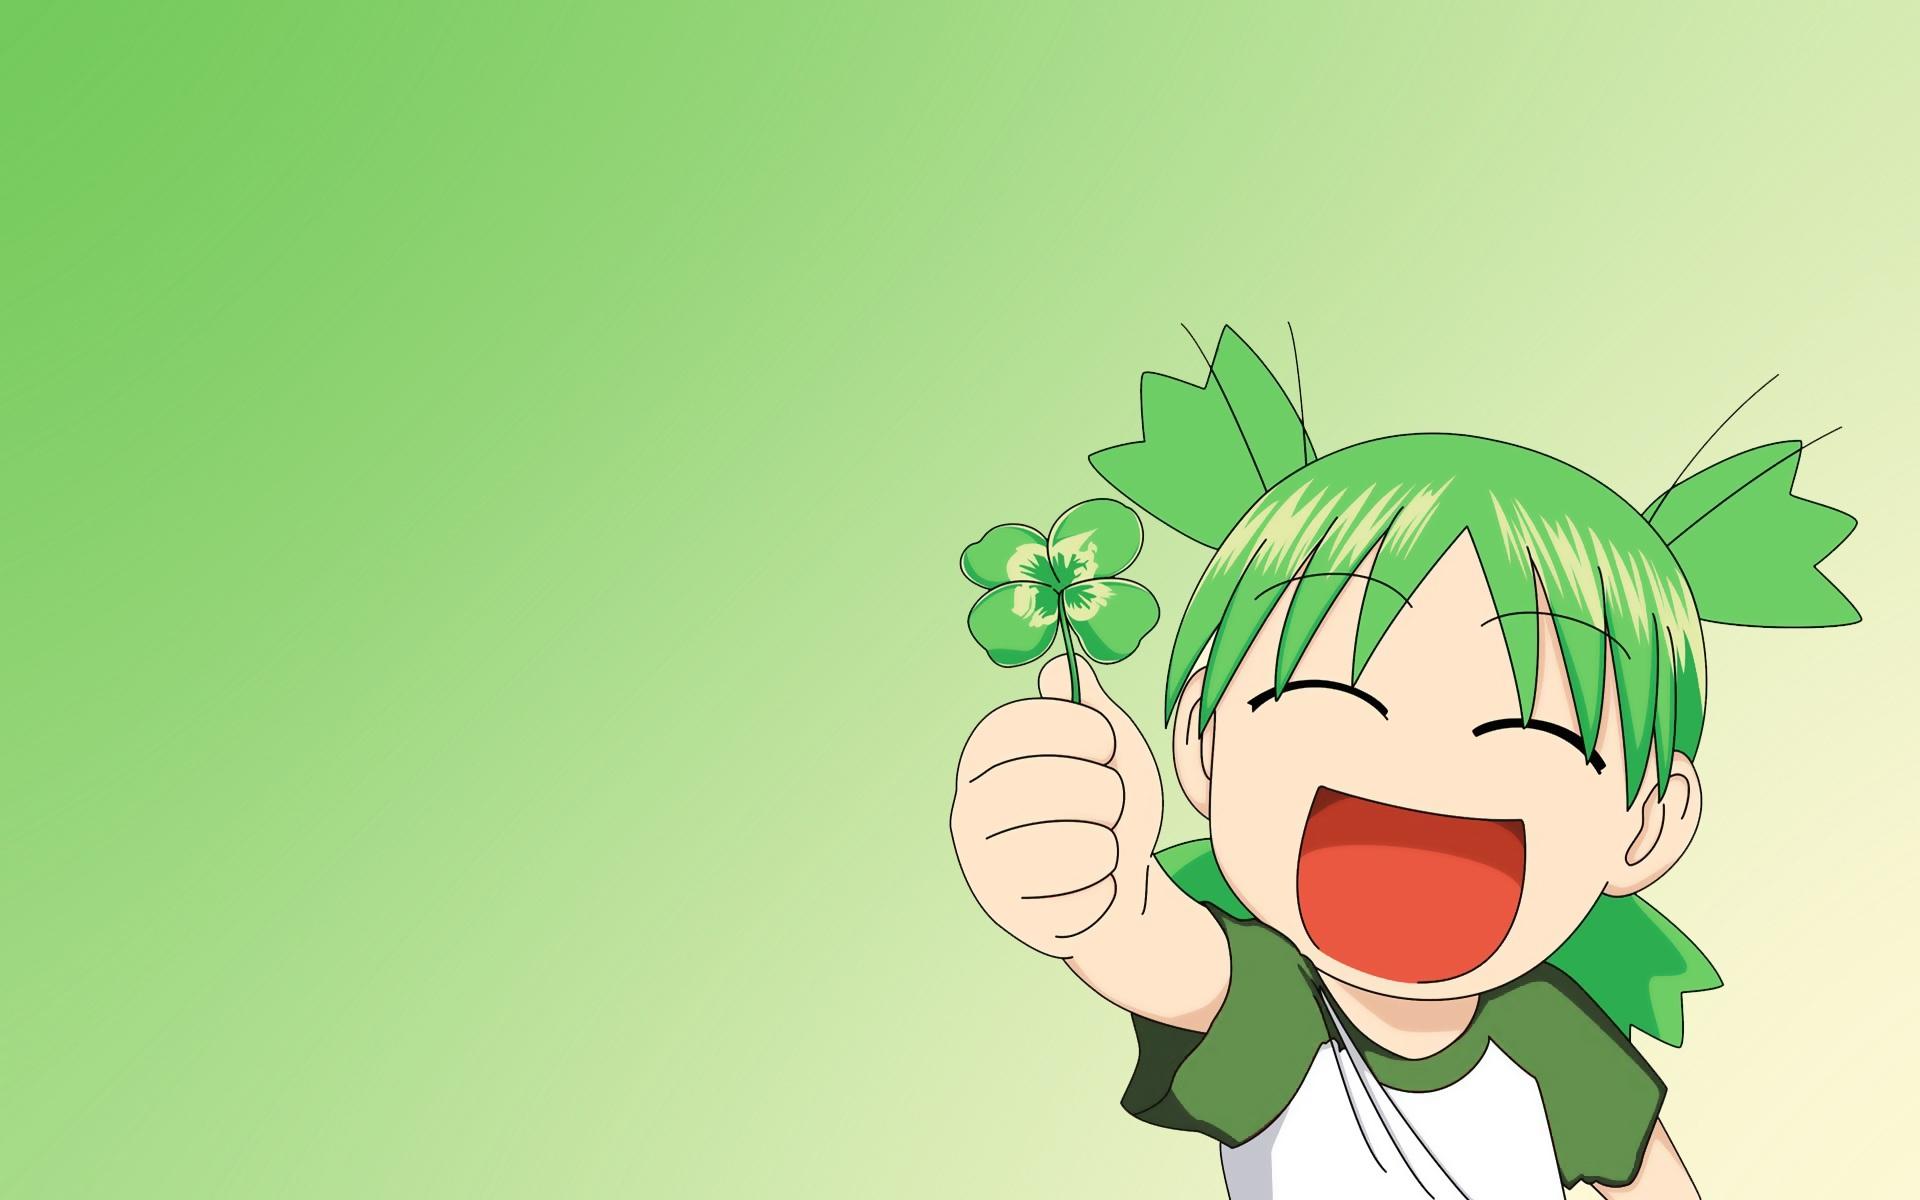 anime-kartinka-yepizod-993c24c